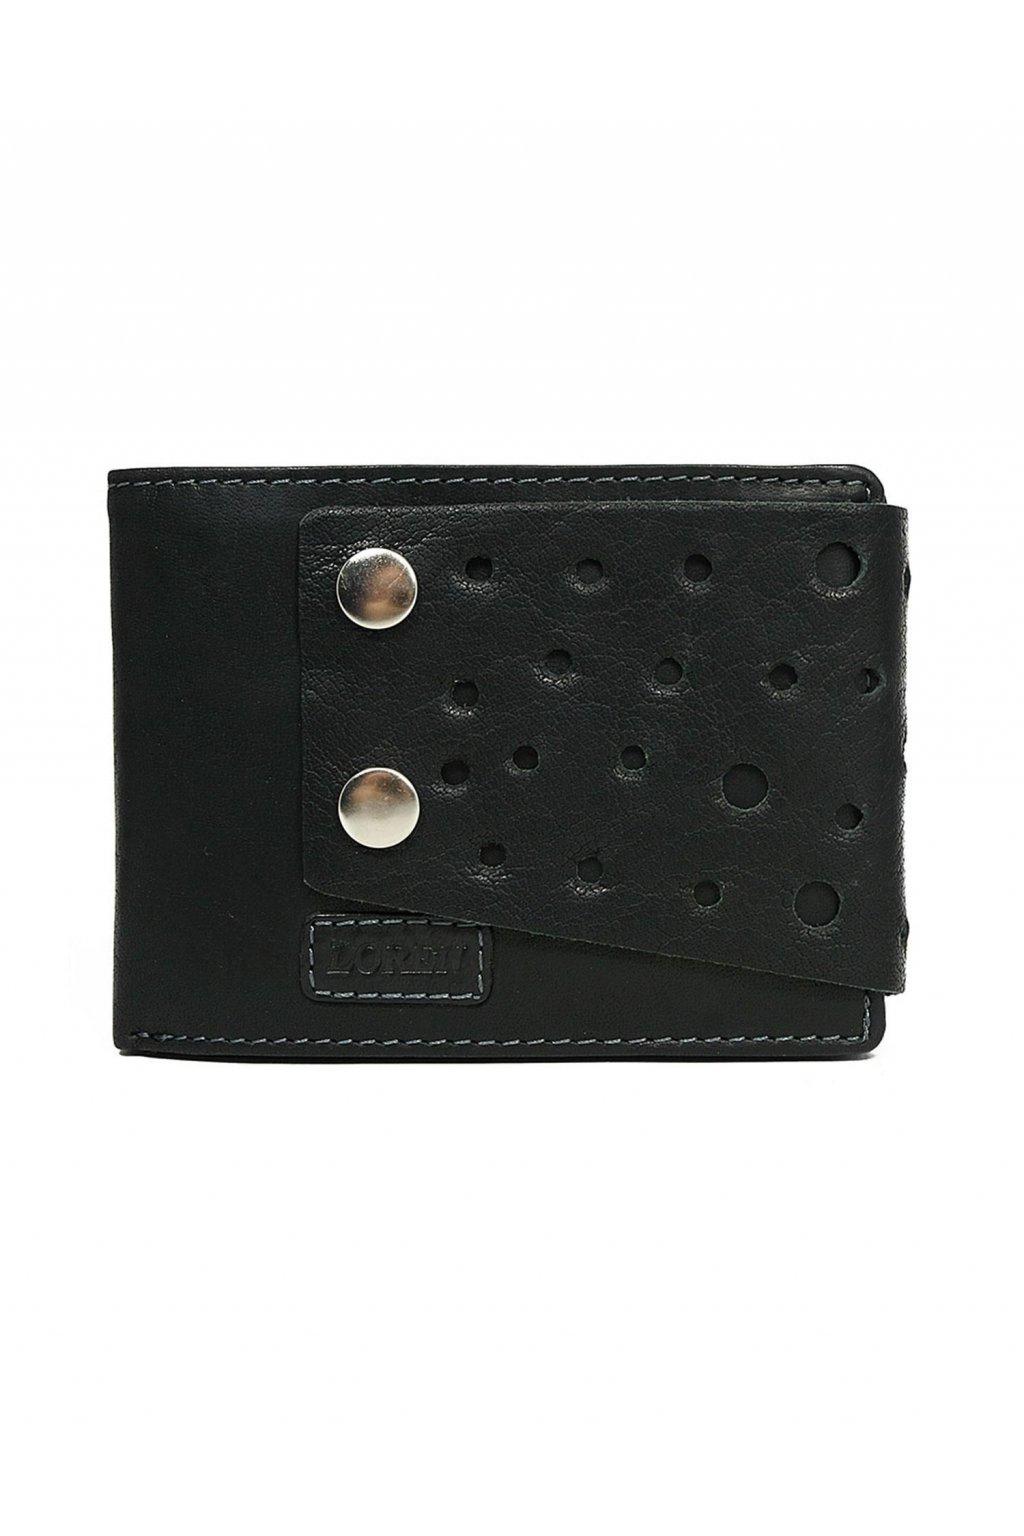 Pánska peňaženka kód CE-PR-905-CL.97